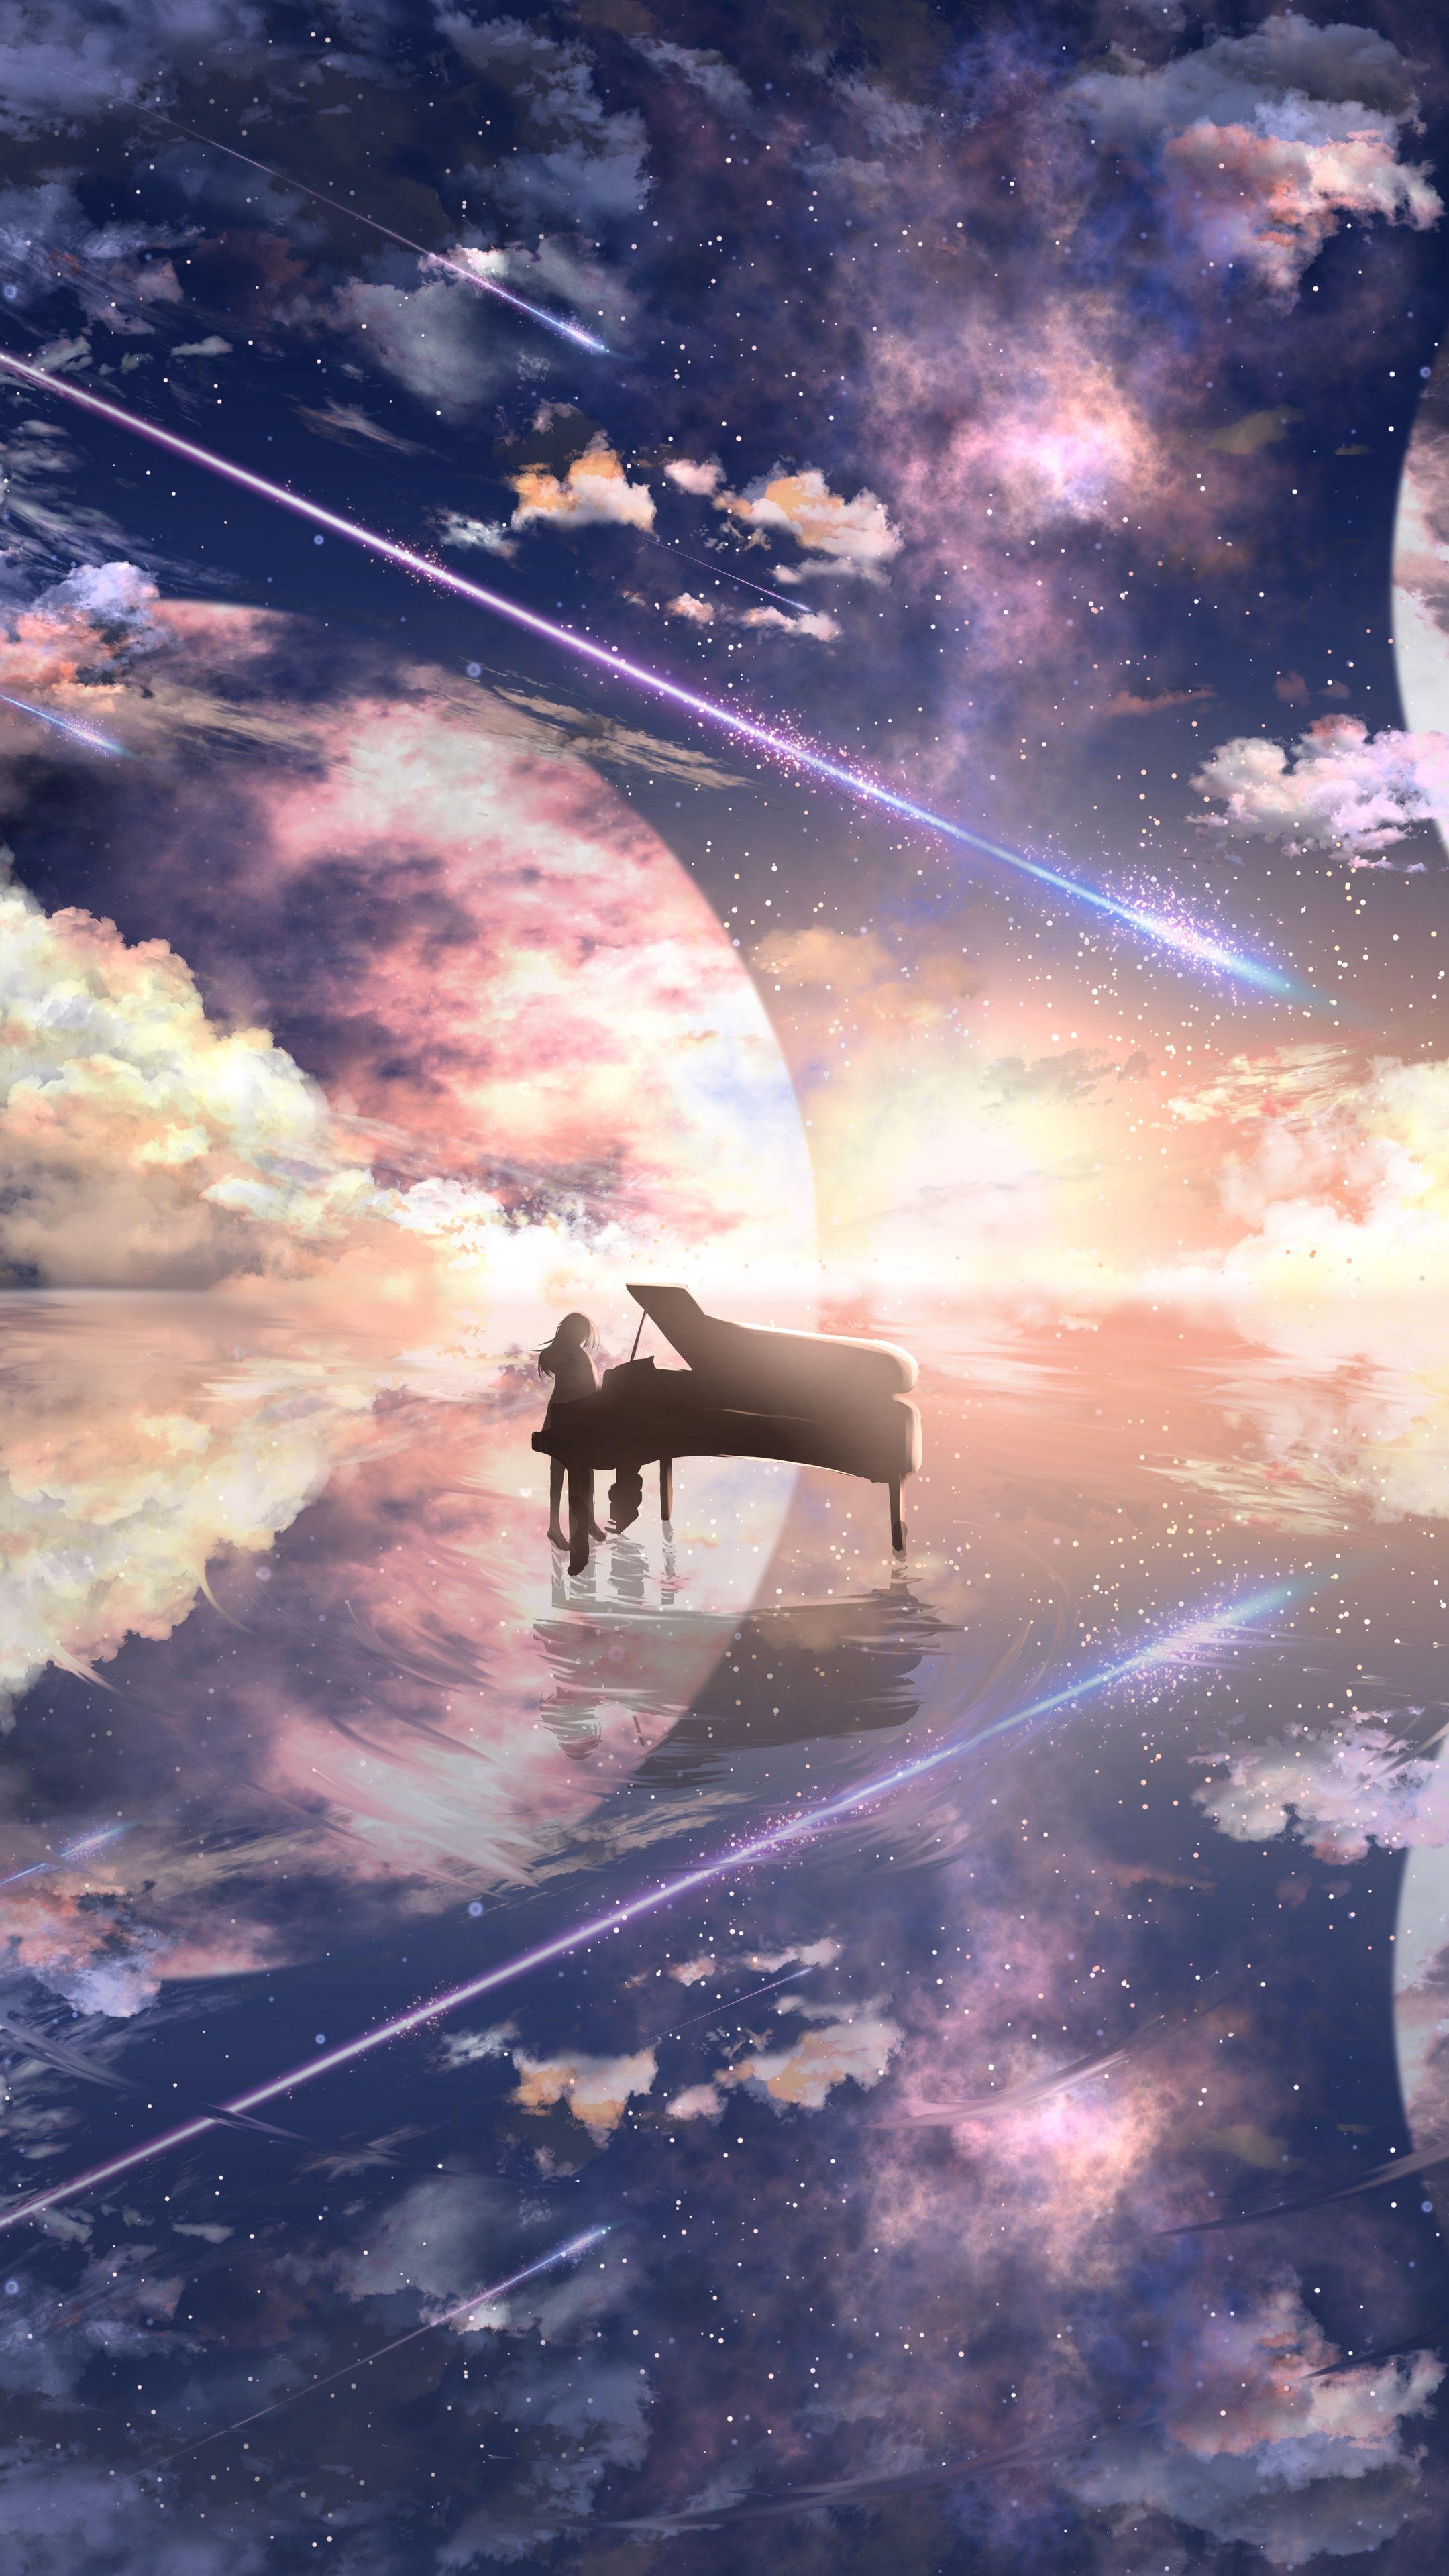 Piano silhouette by ツチヤ [2160x3840] in 2020 Piano